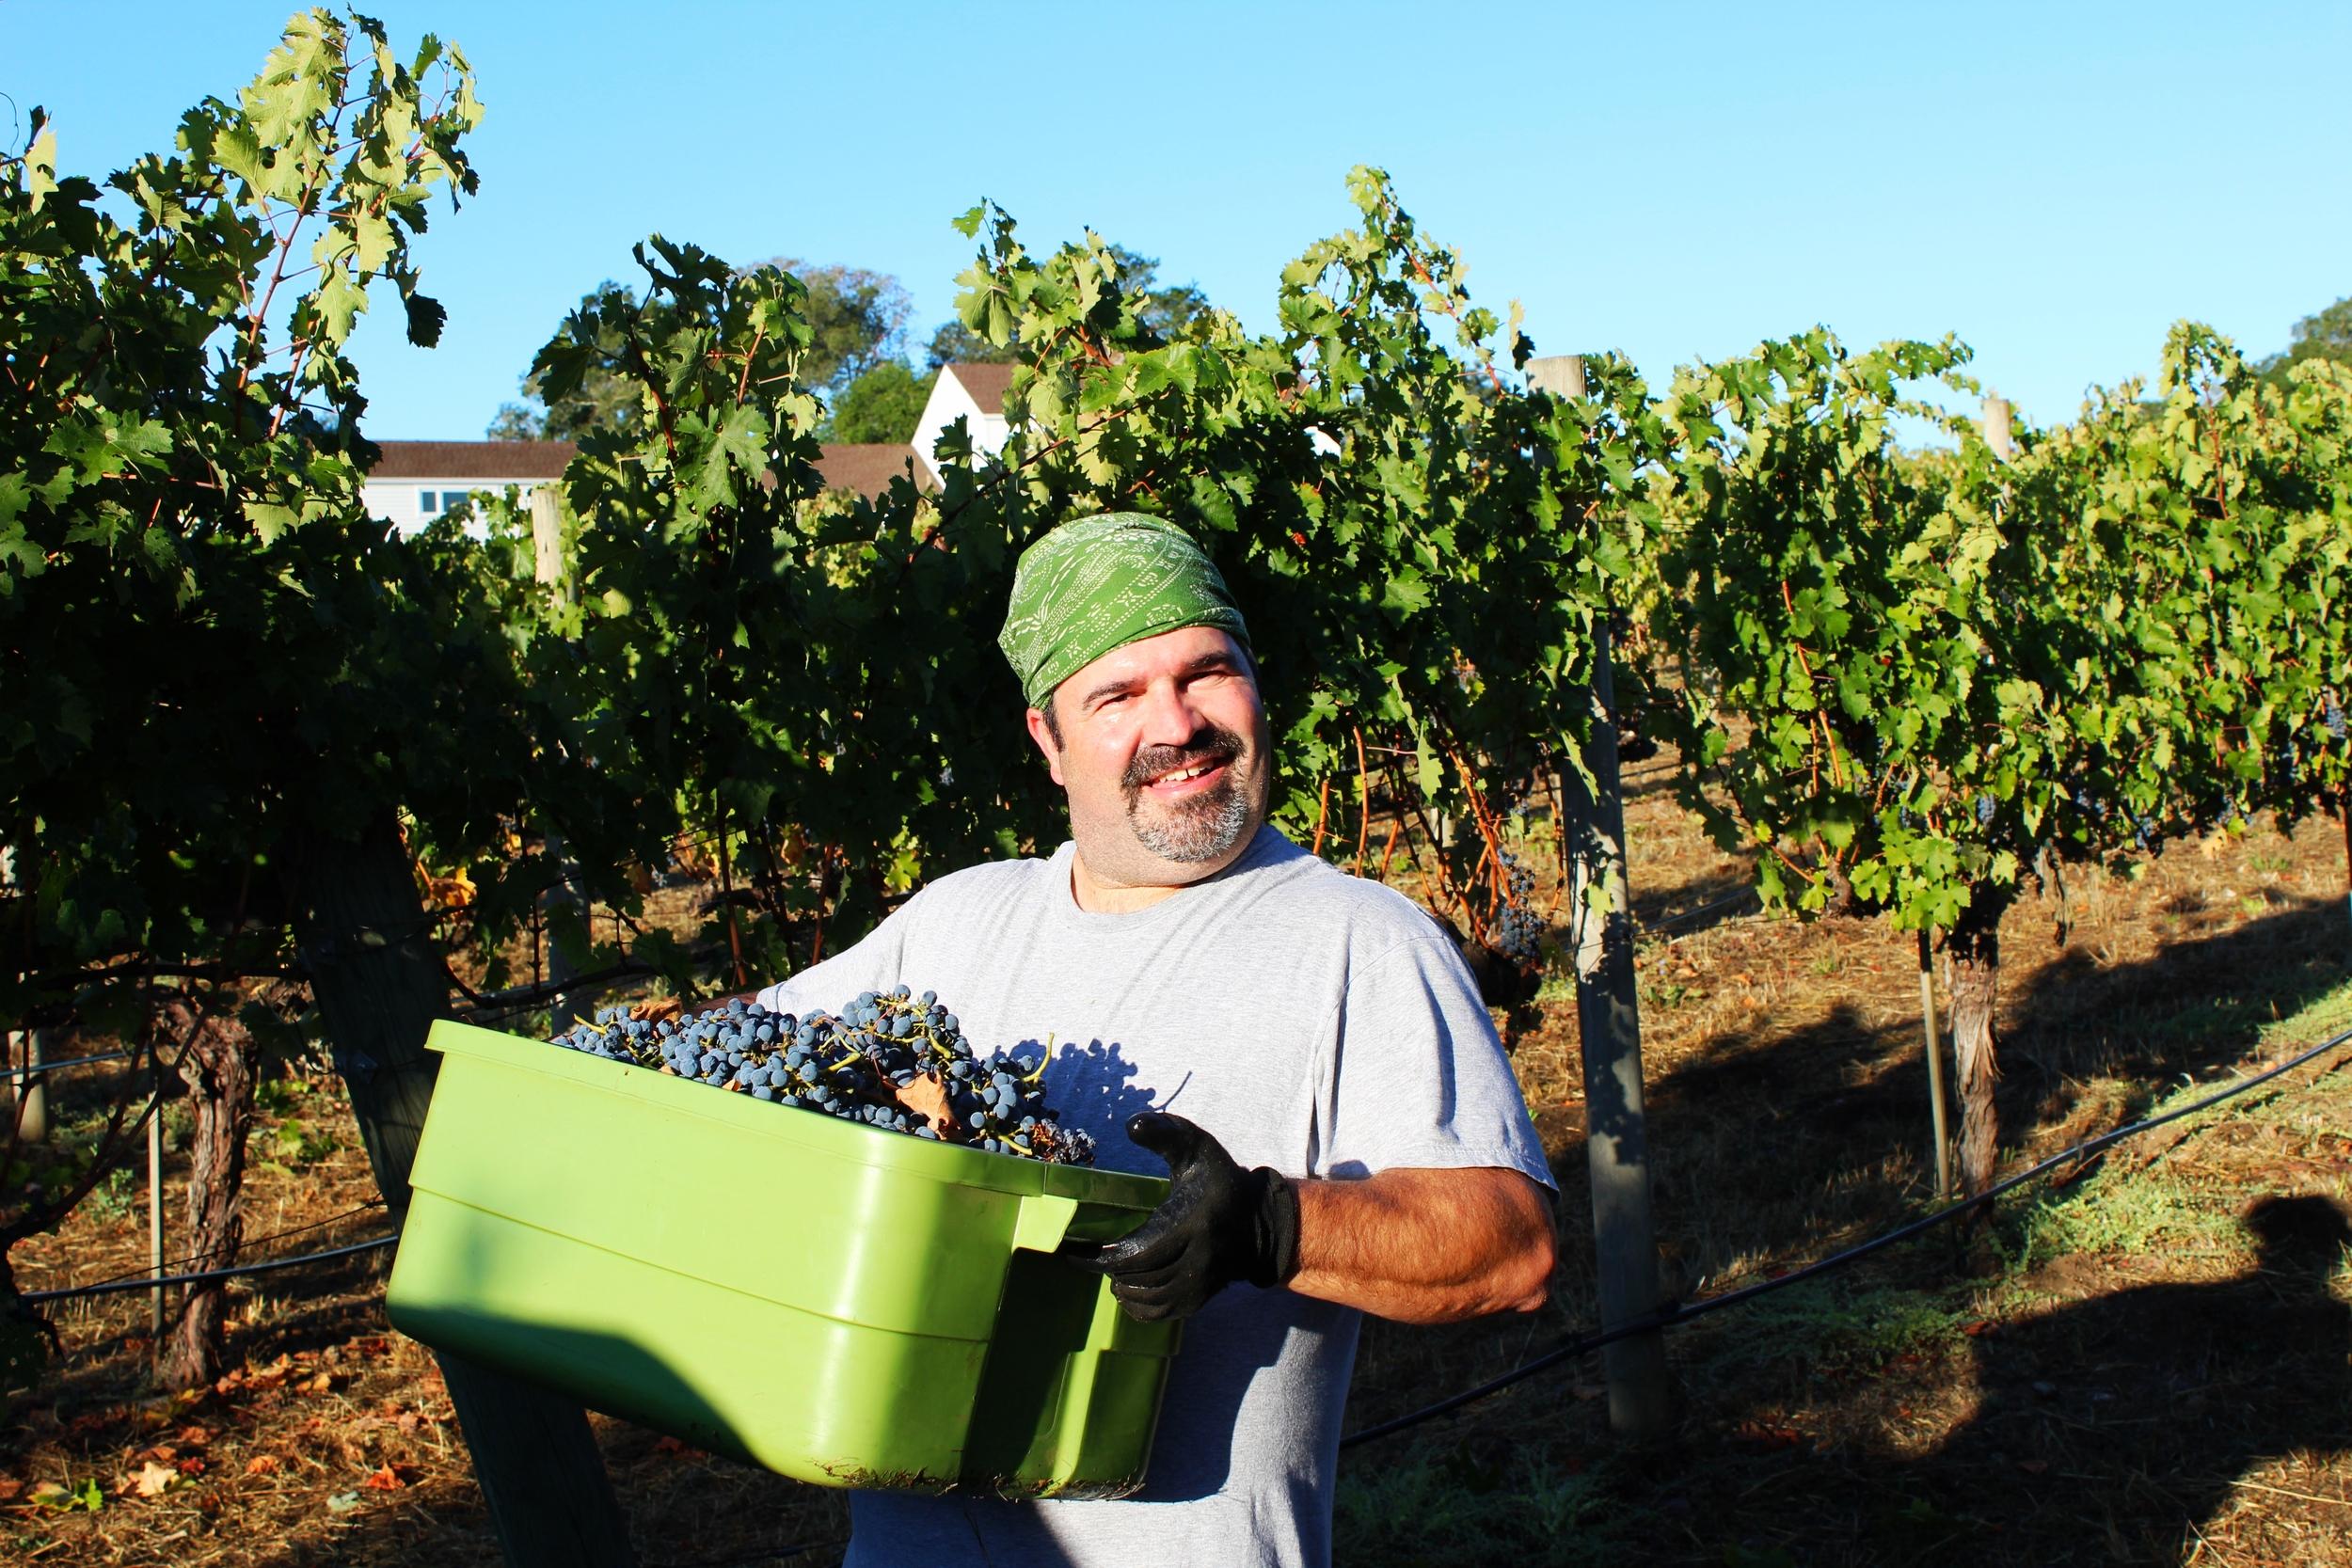 Picker, Winemaker and Owner, David Scheidt